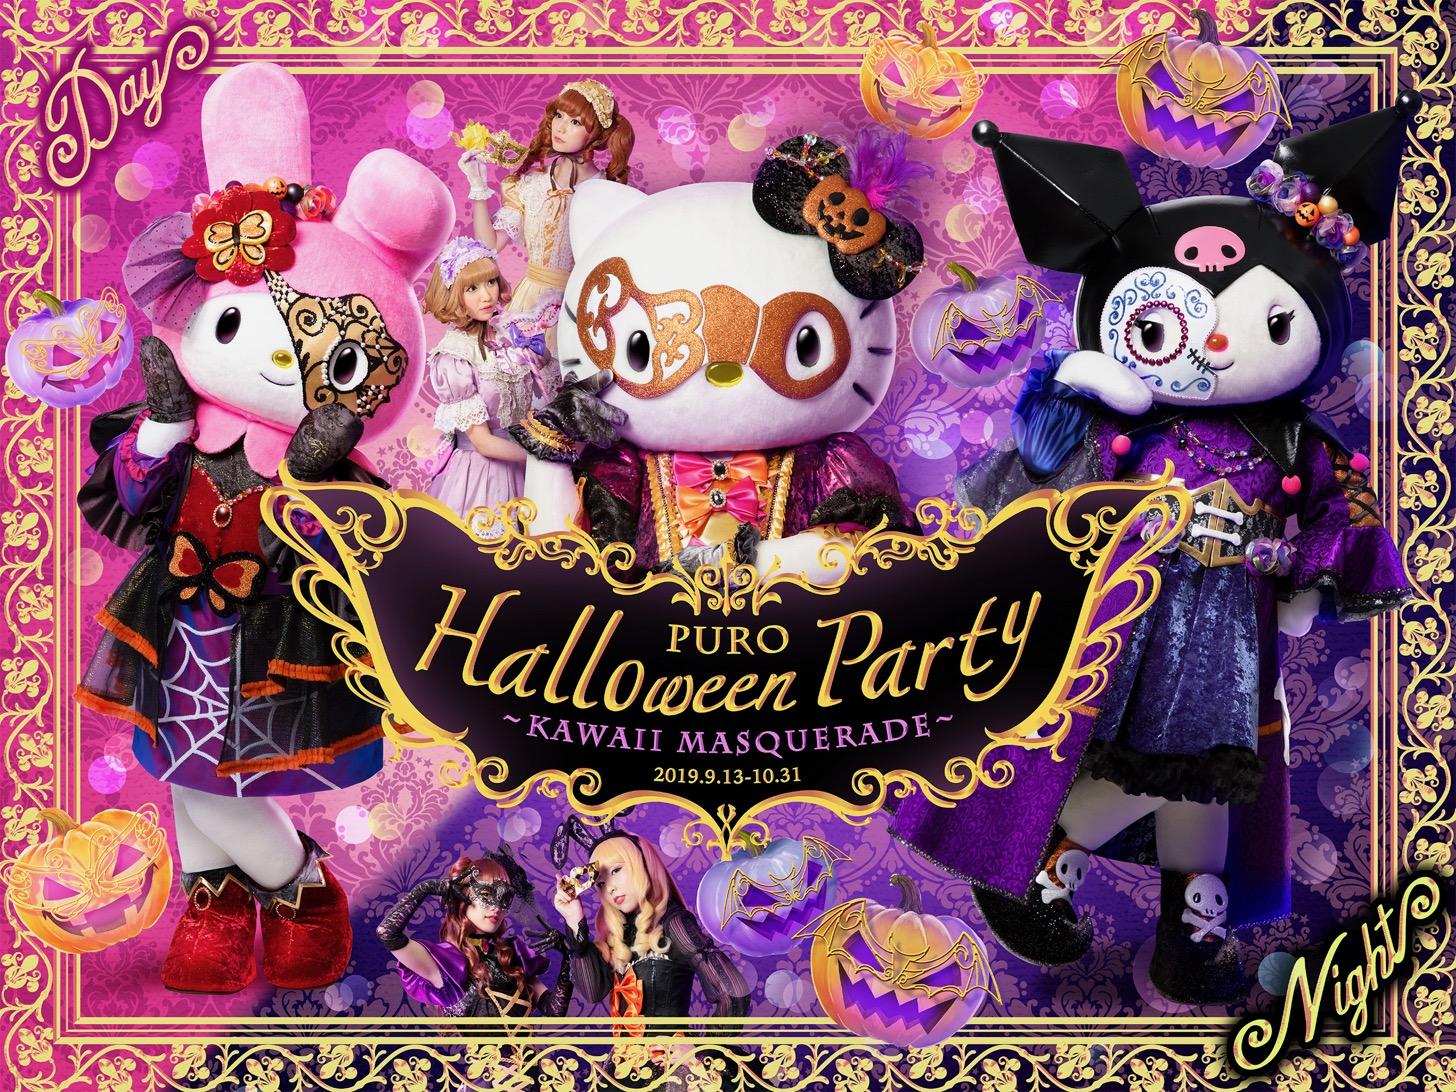 PURO HALLOWEEN PARTY ~KAWAII MASQUERADE~(ピューロハロウィンパーティ ~カワイイマスカレード~)